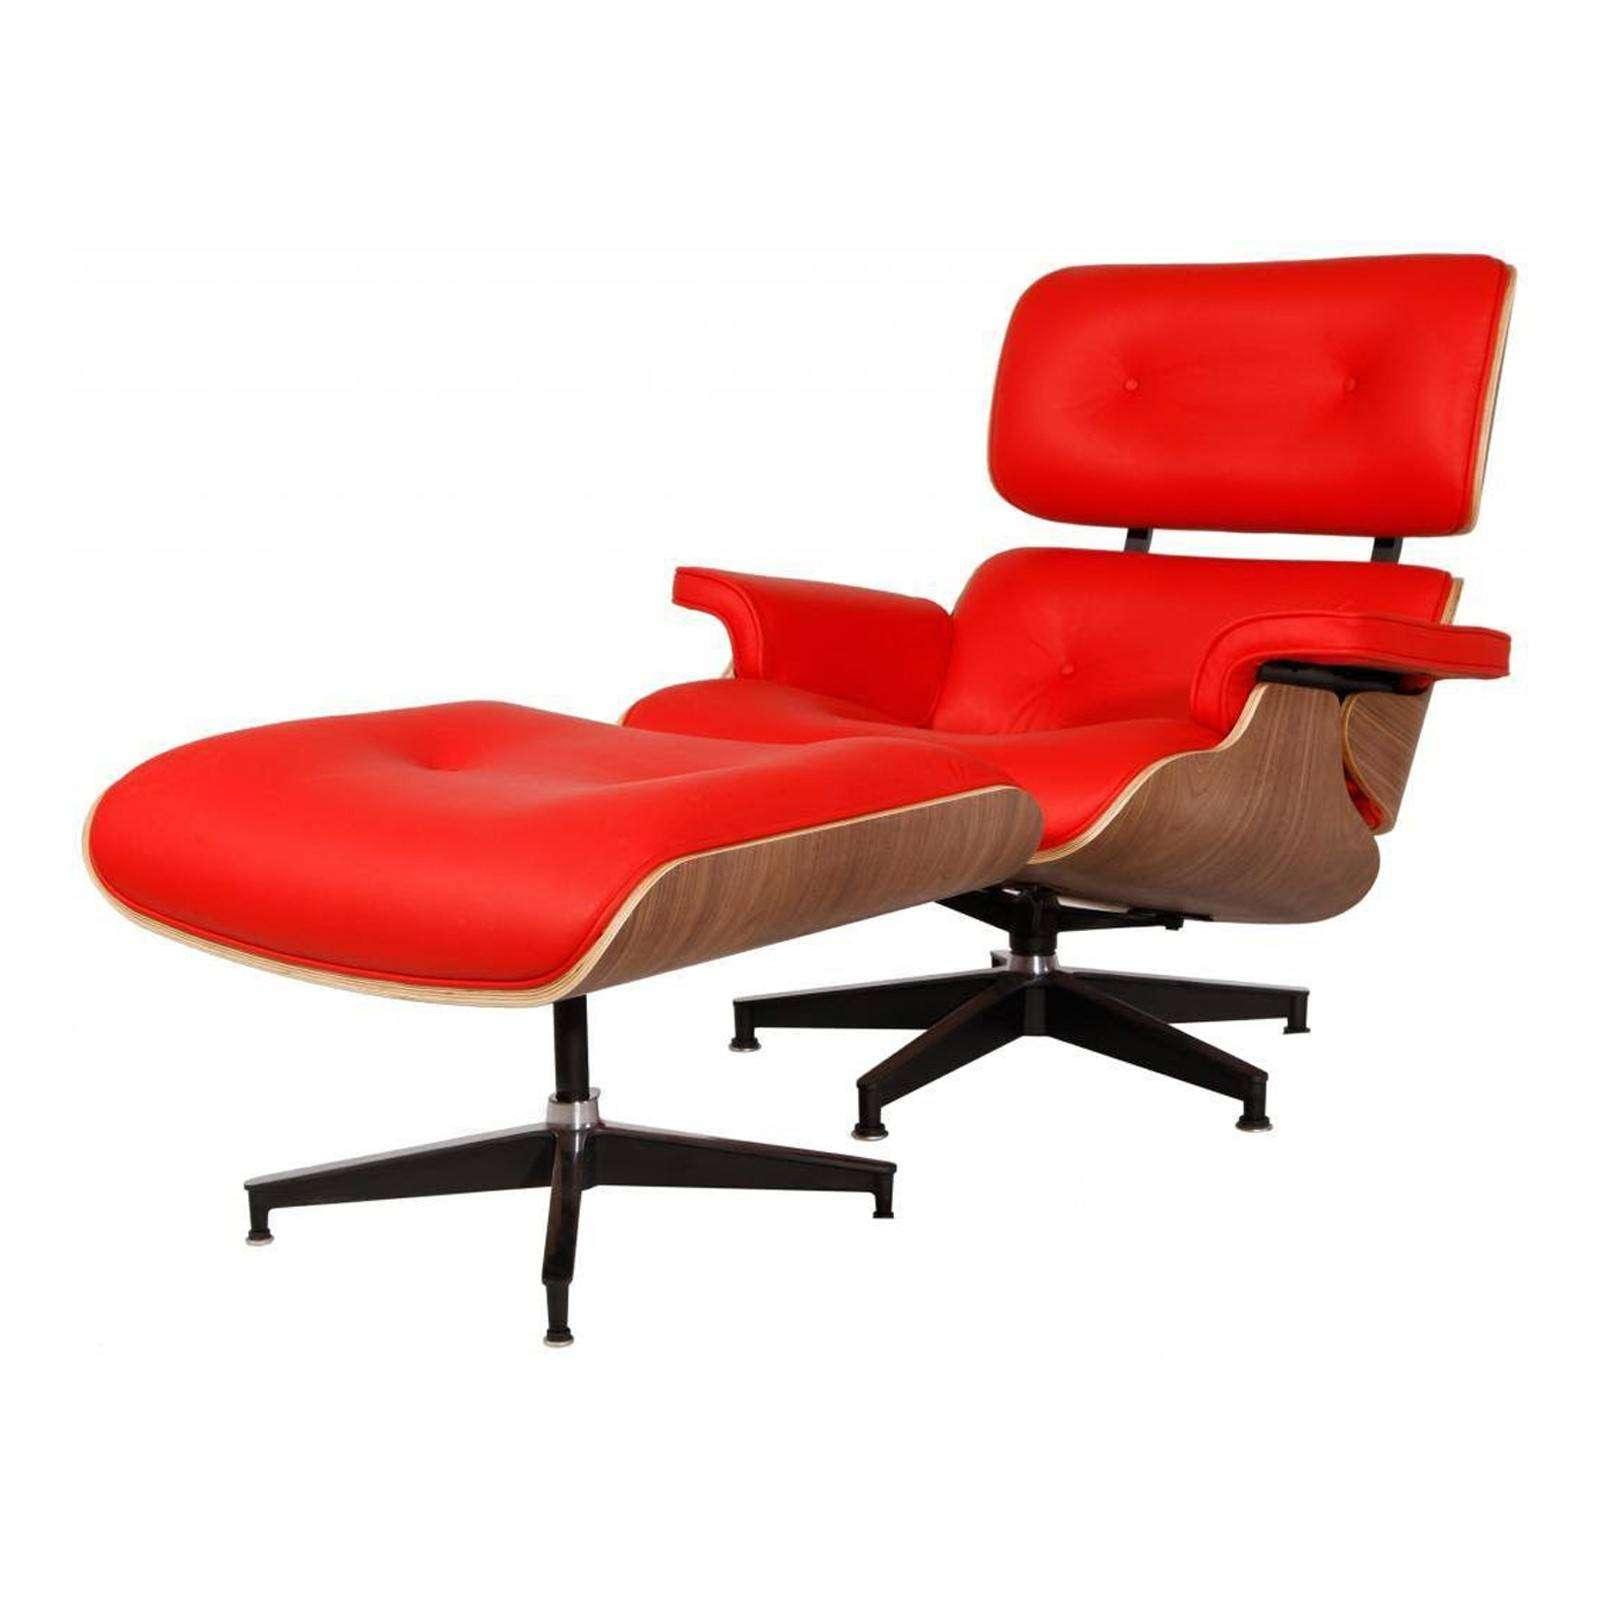 Eames Lounge Chair Ottoman Replica Modterior Usa